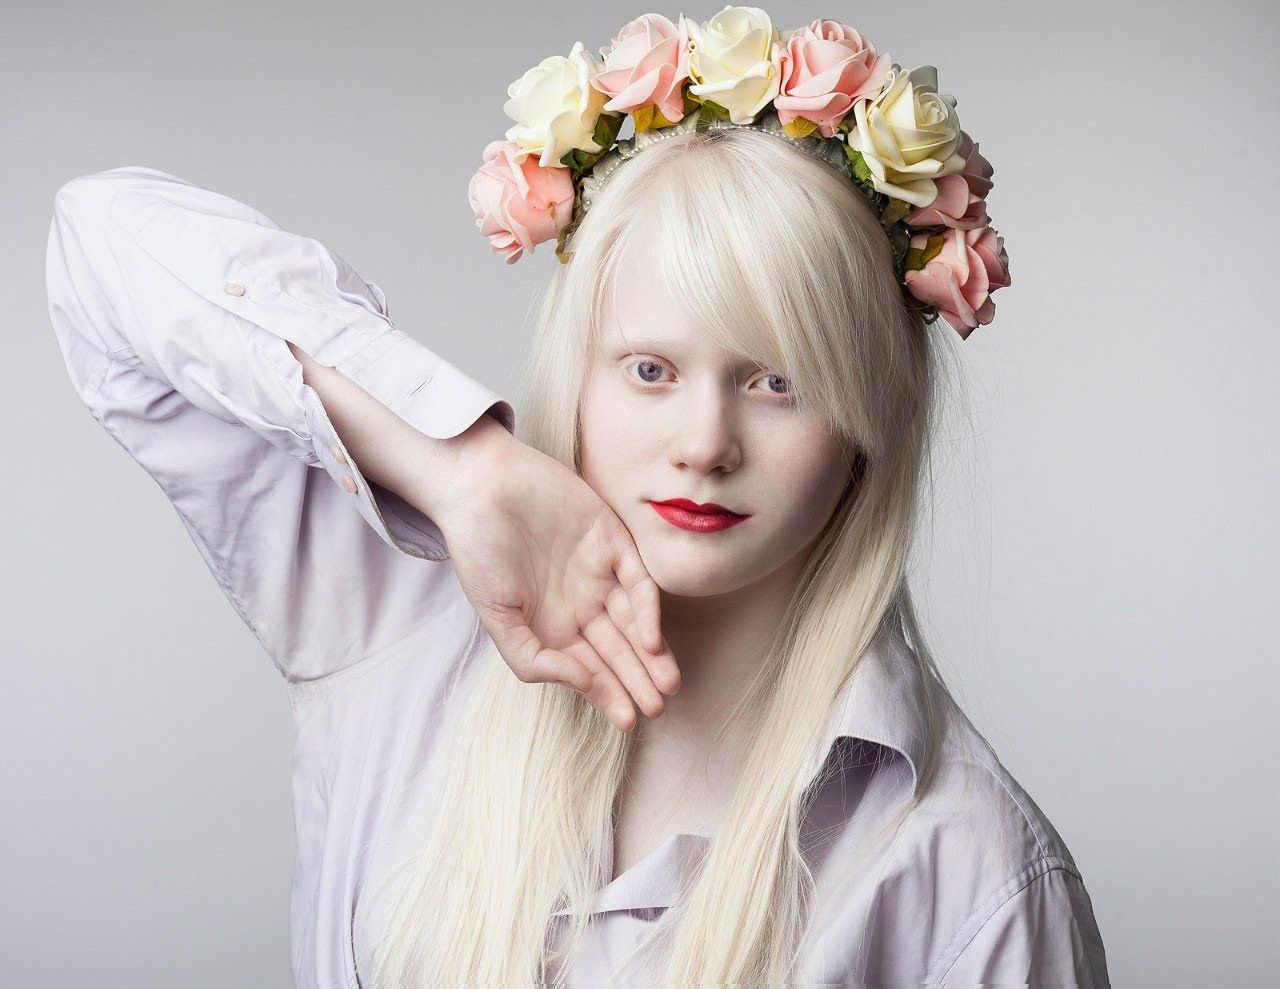 Albino japanese girl, katrina kaif kissing juicy boobs